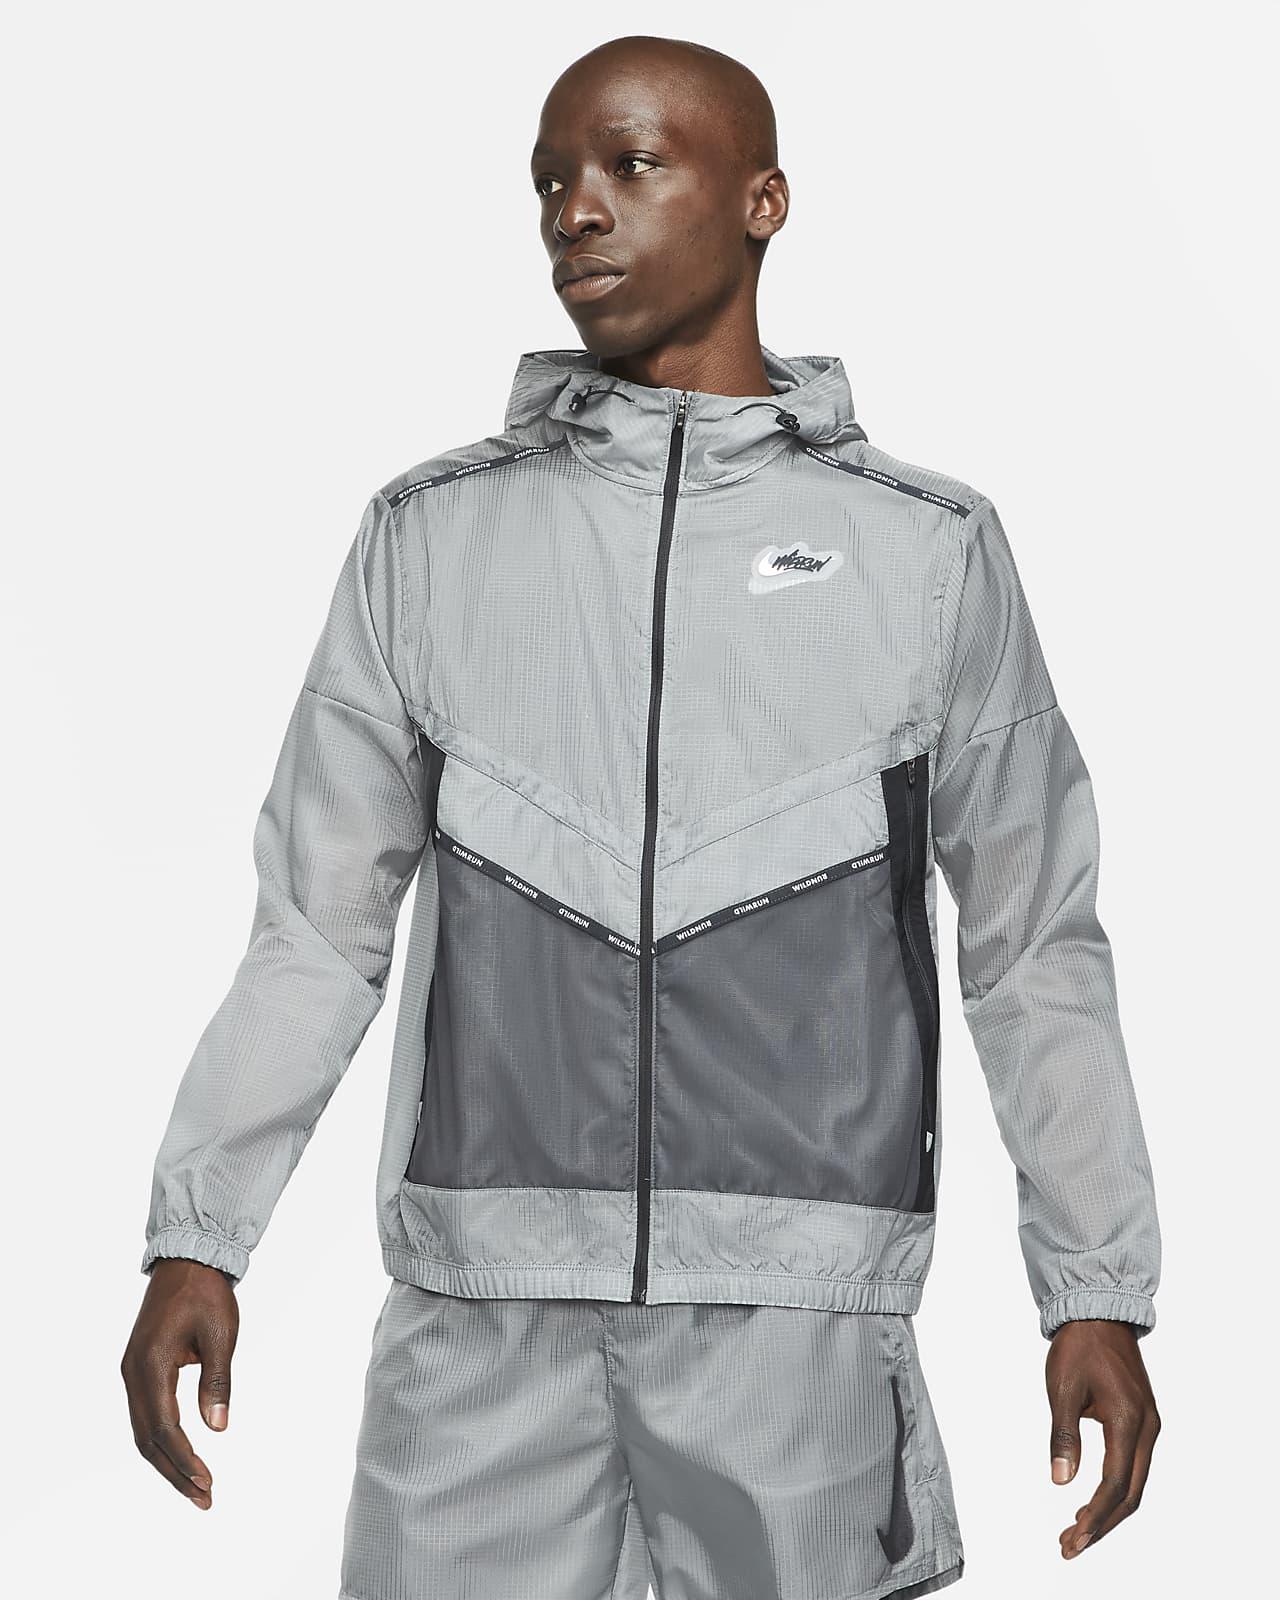 Nike Repel Wild Run Windrunner Herren-Laufjacke mit Grafik